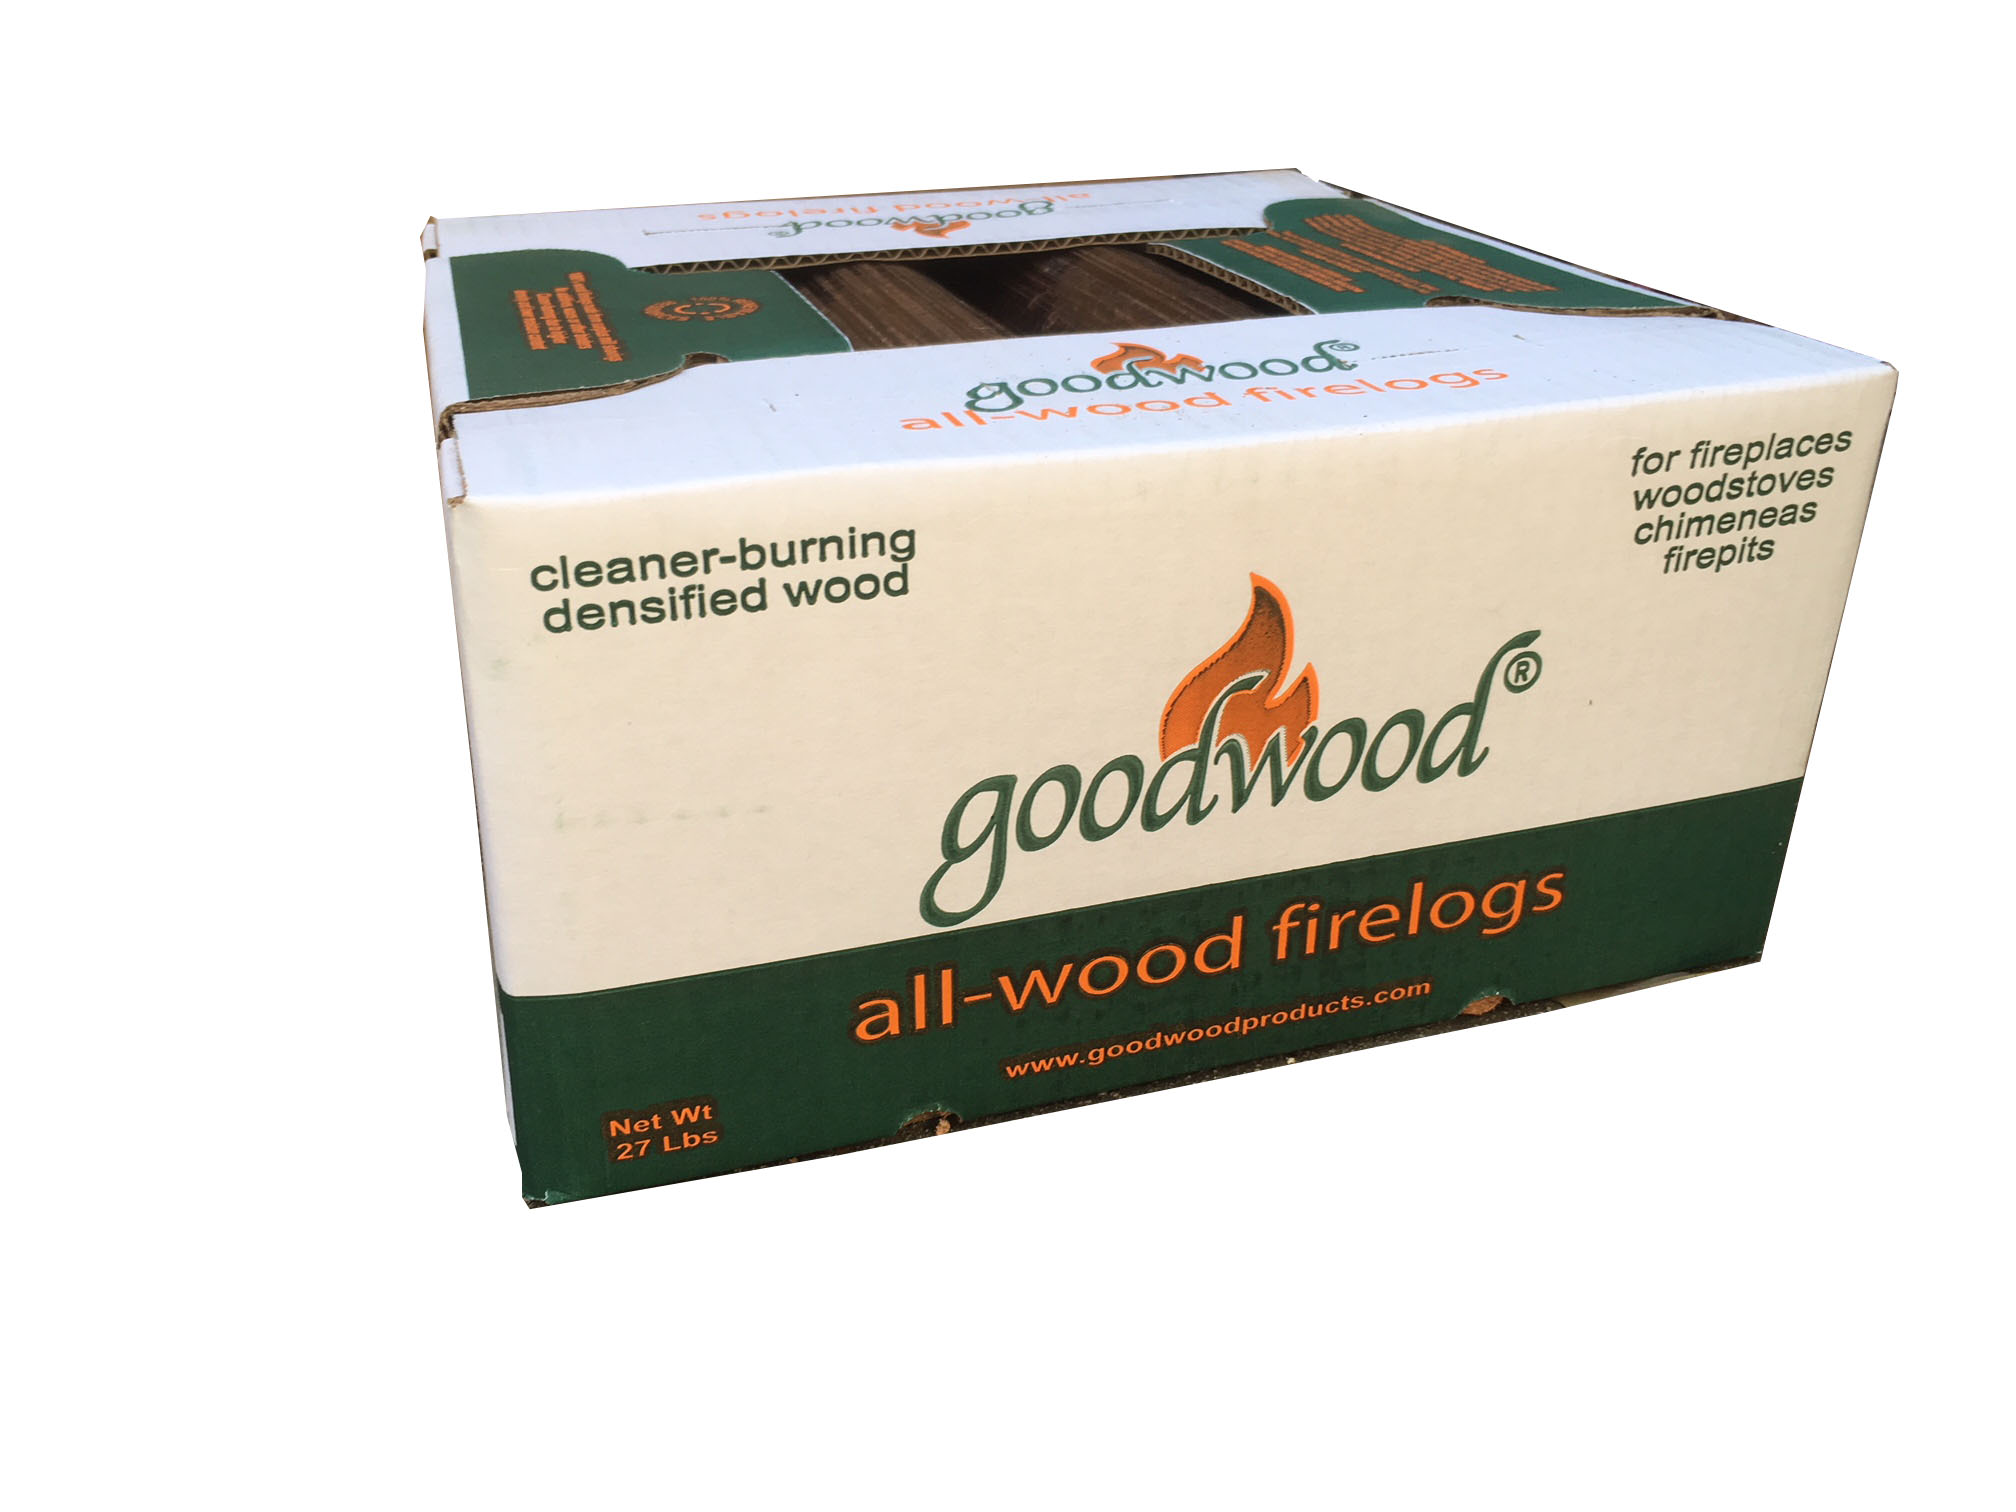 2 Cases All-Wood Firelogs Via UPS